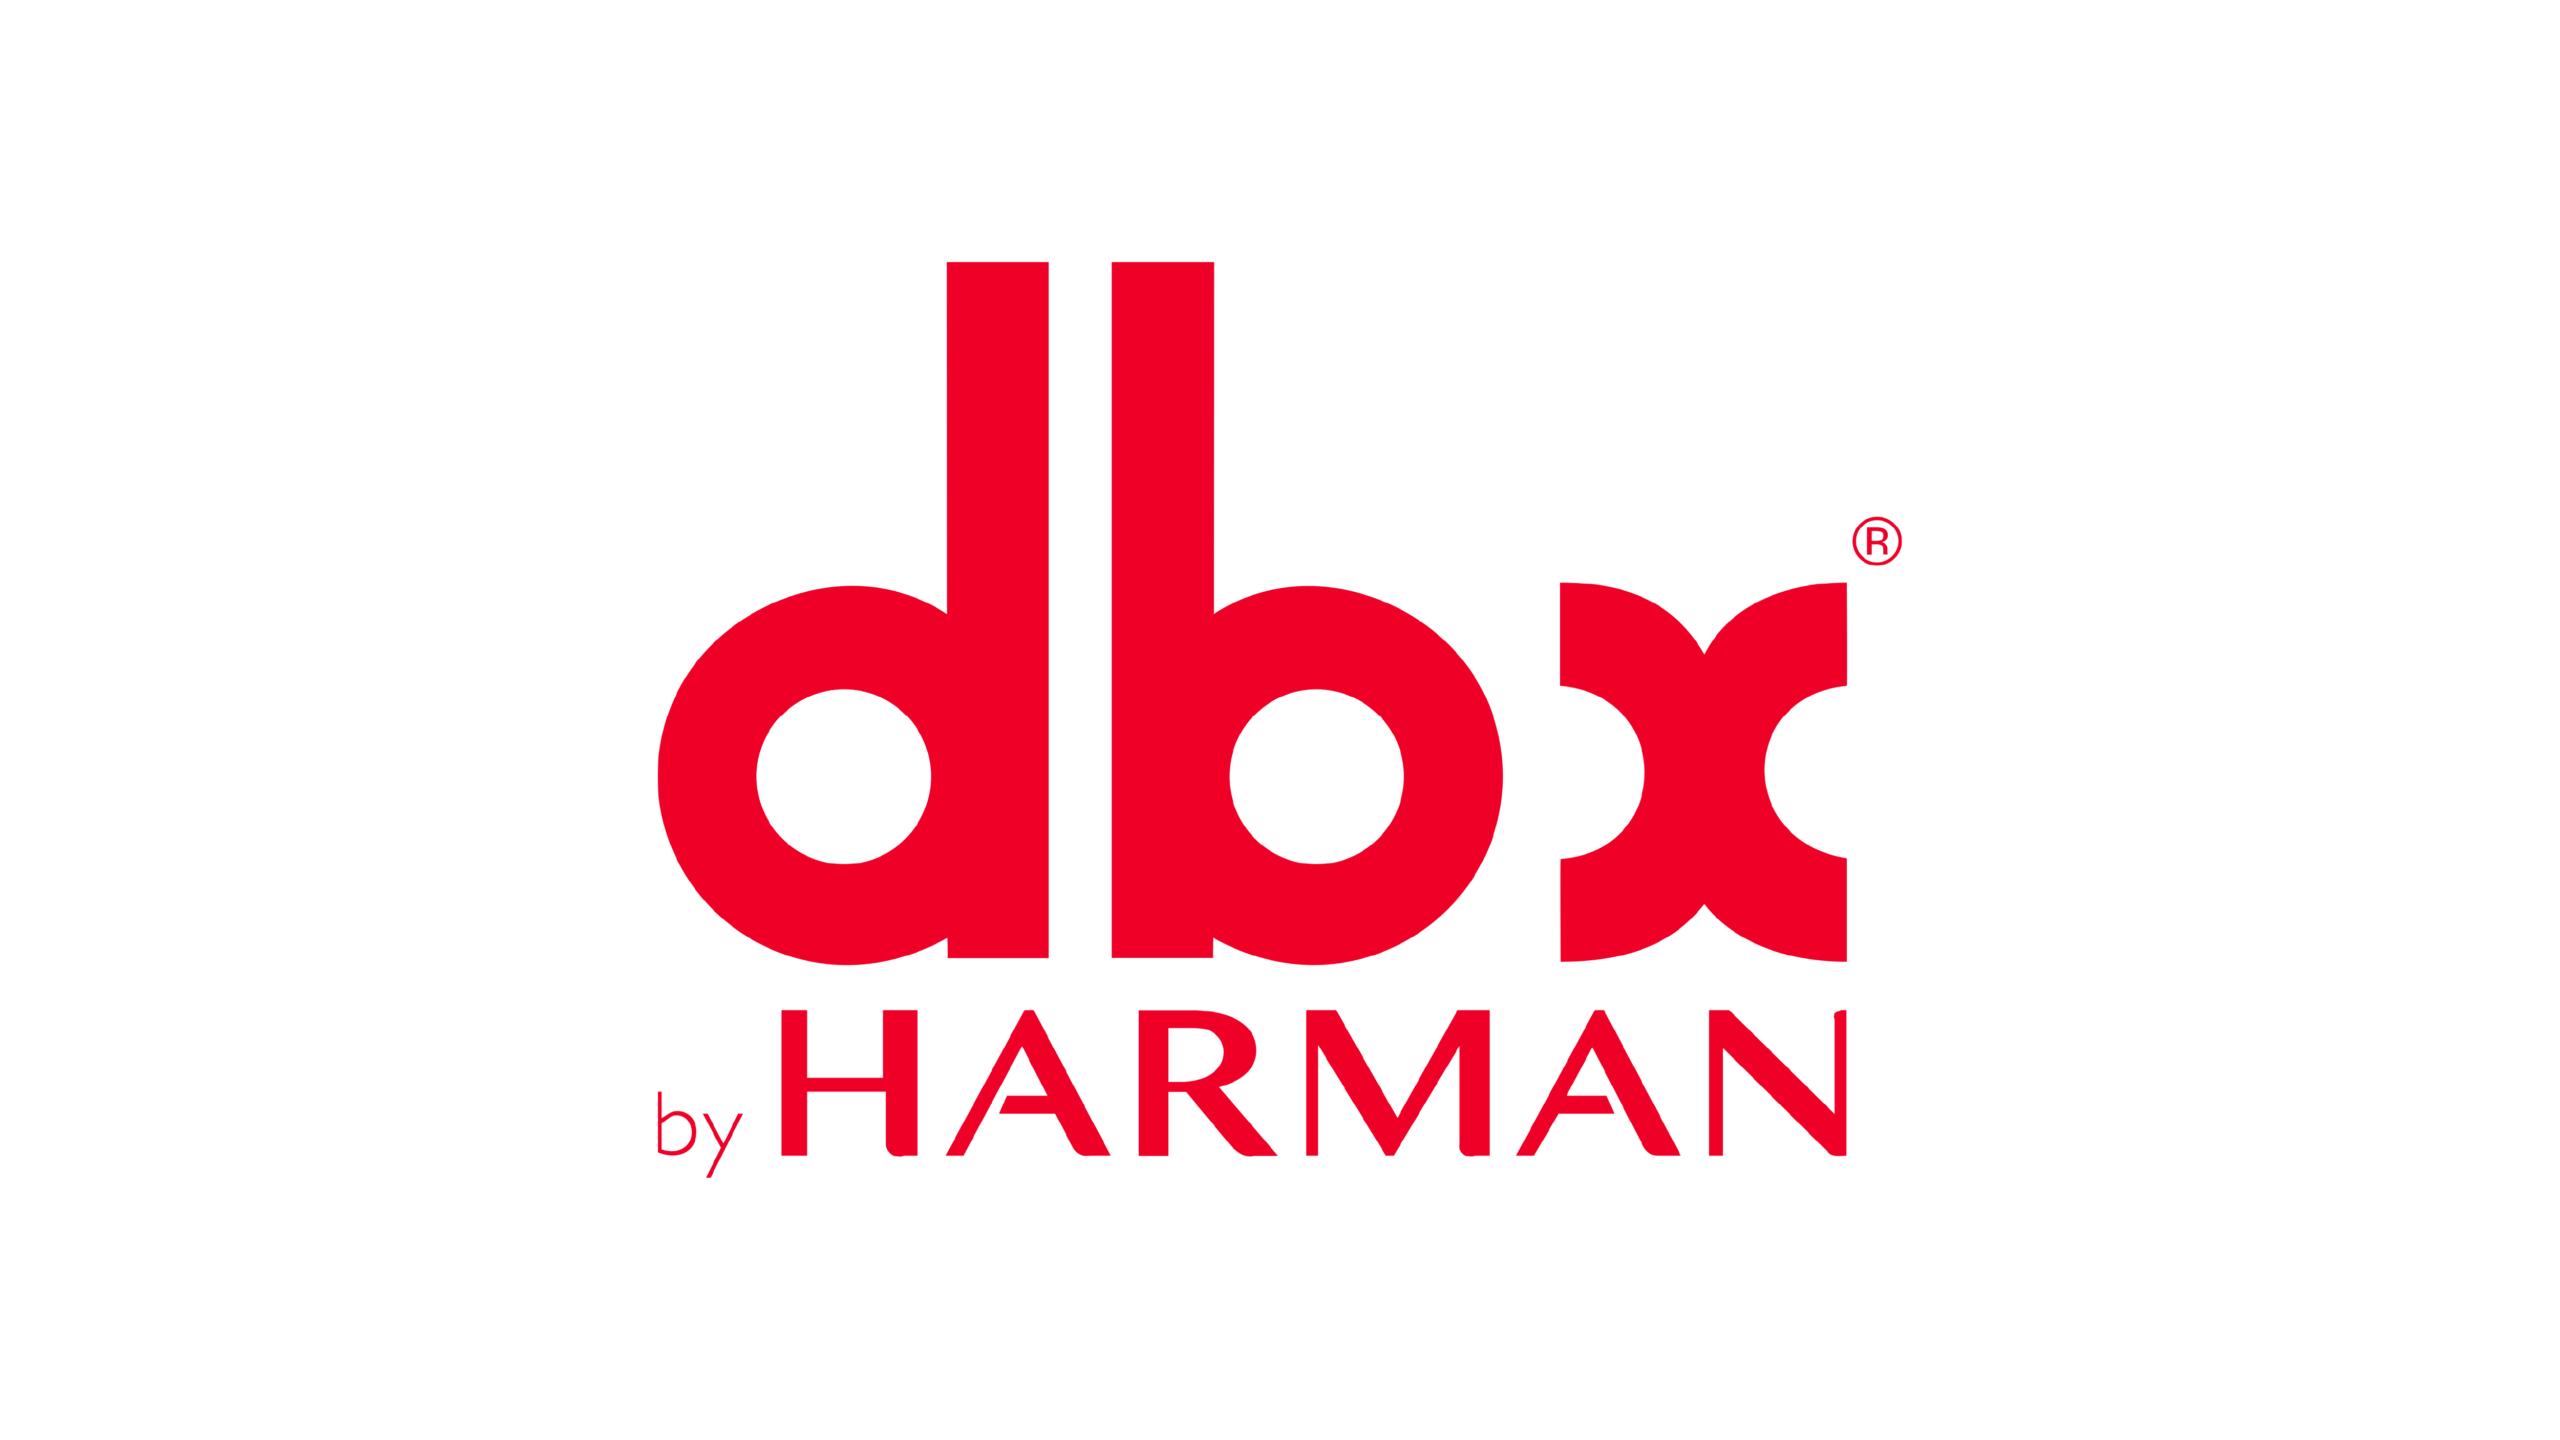 dbx by harman logo